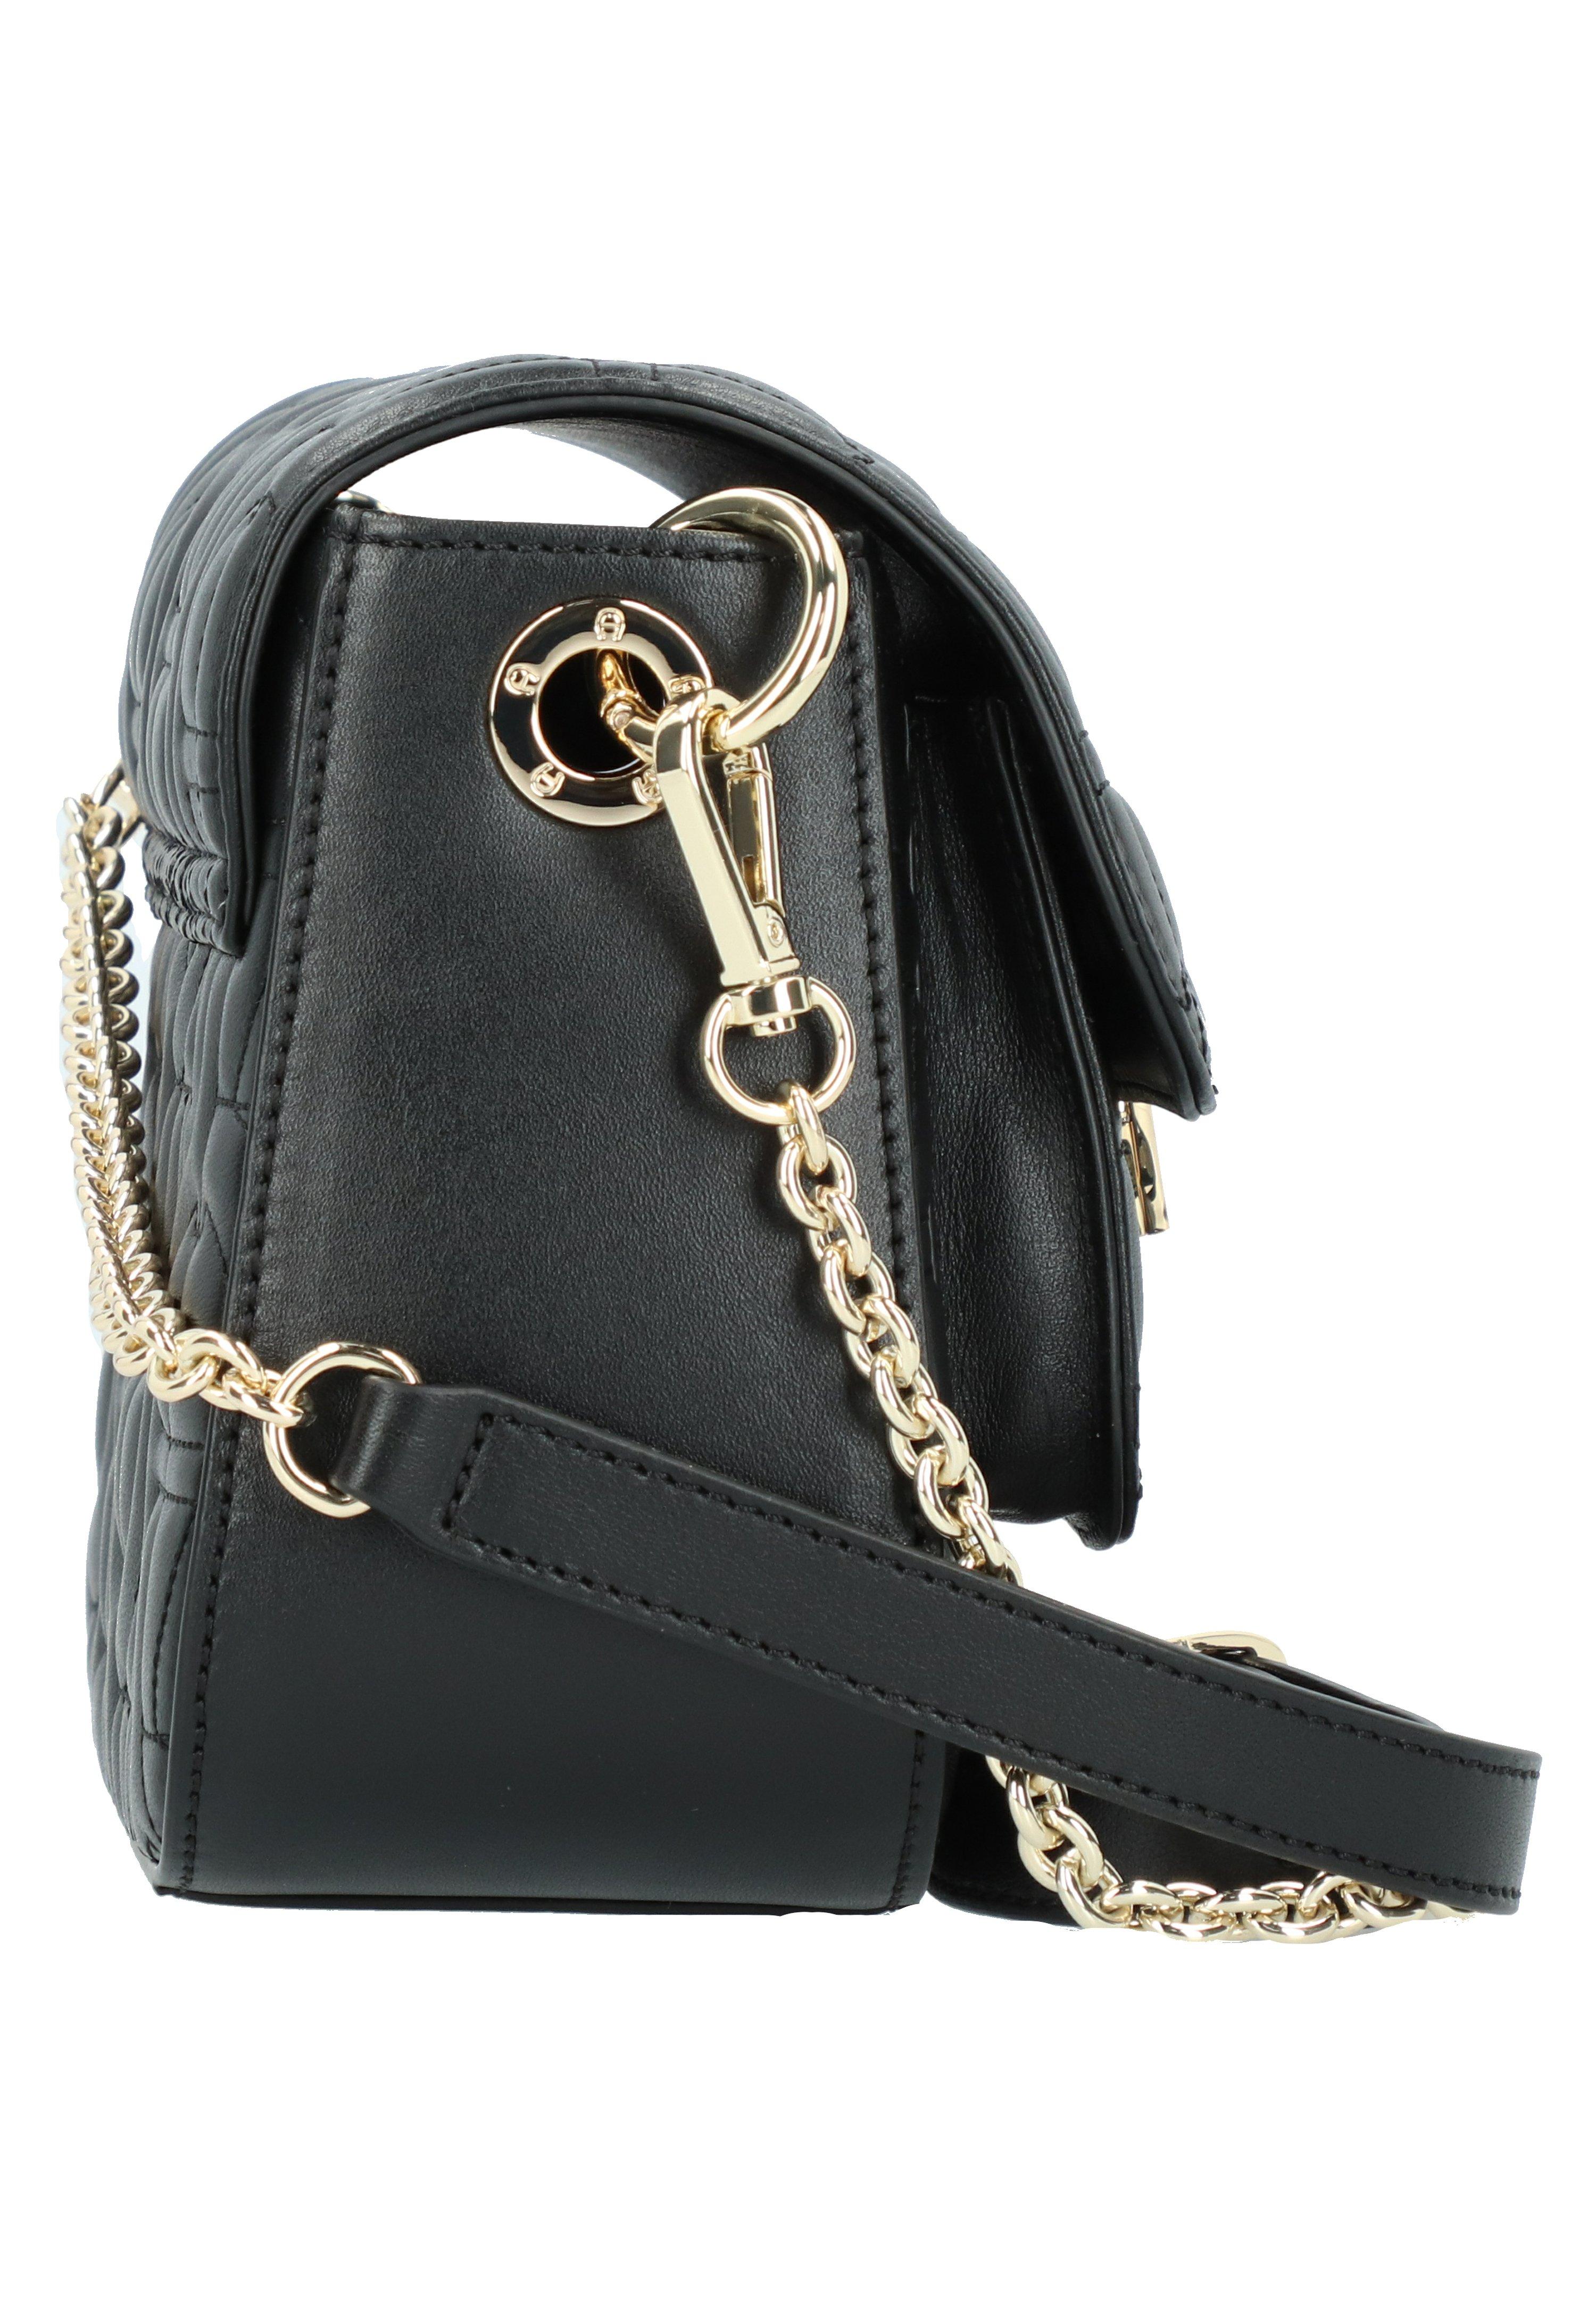 Aigner GENOVEVA  - Schoudertas - black - Dames Accessoires en tassen 2020